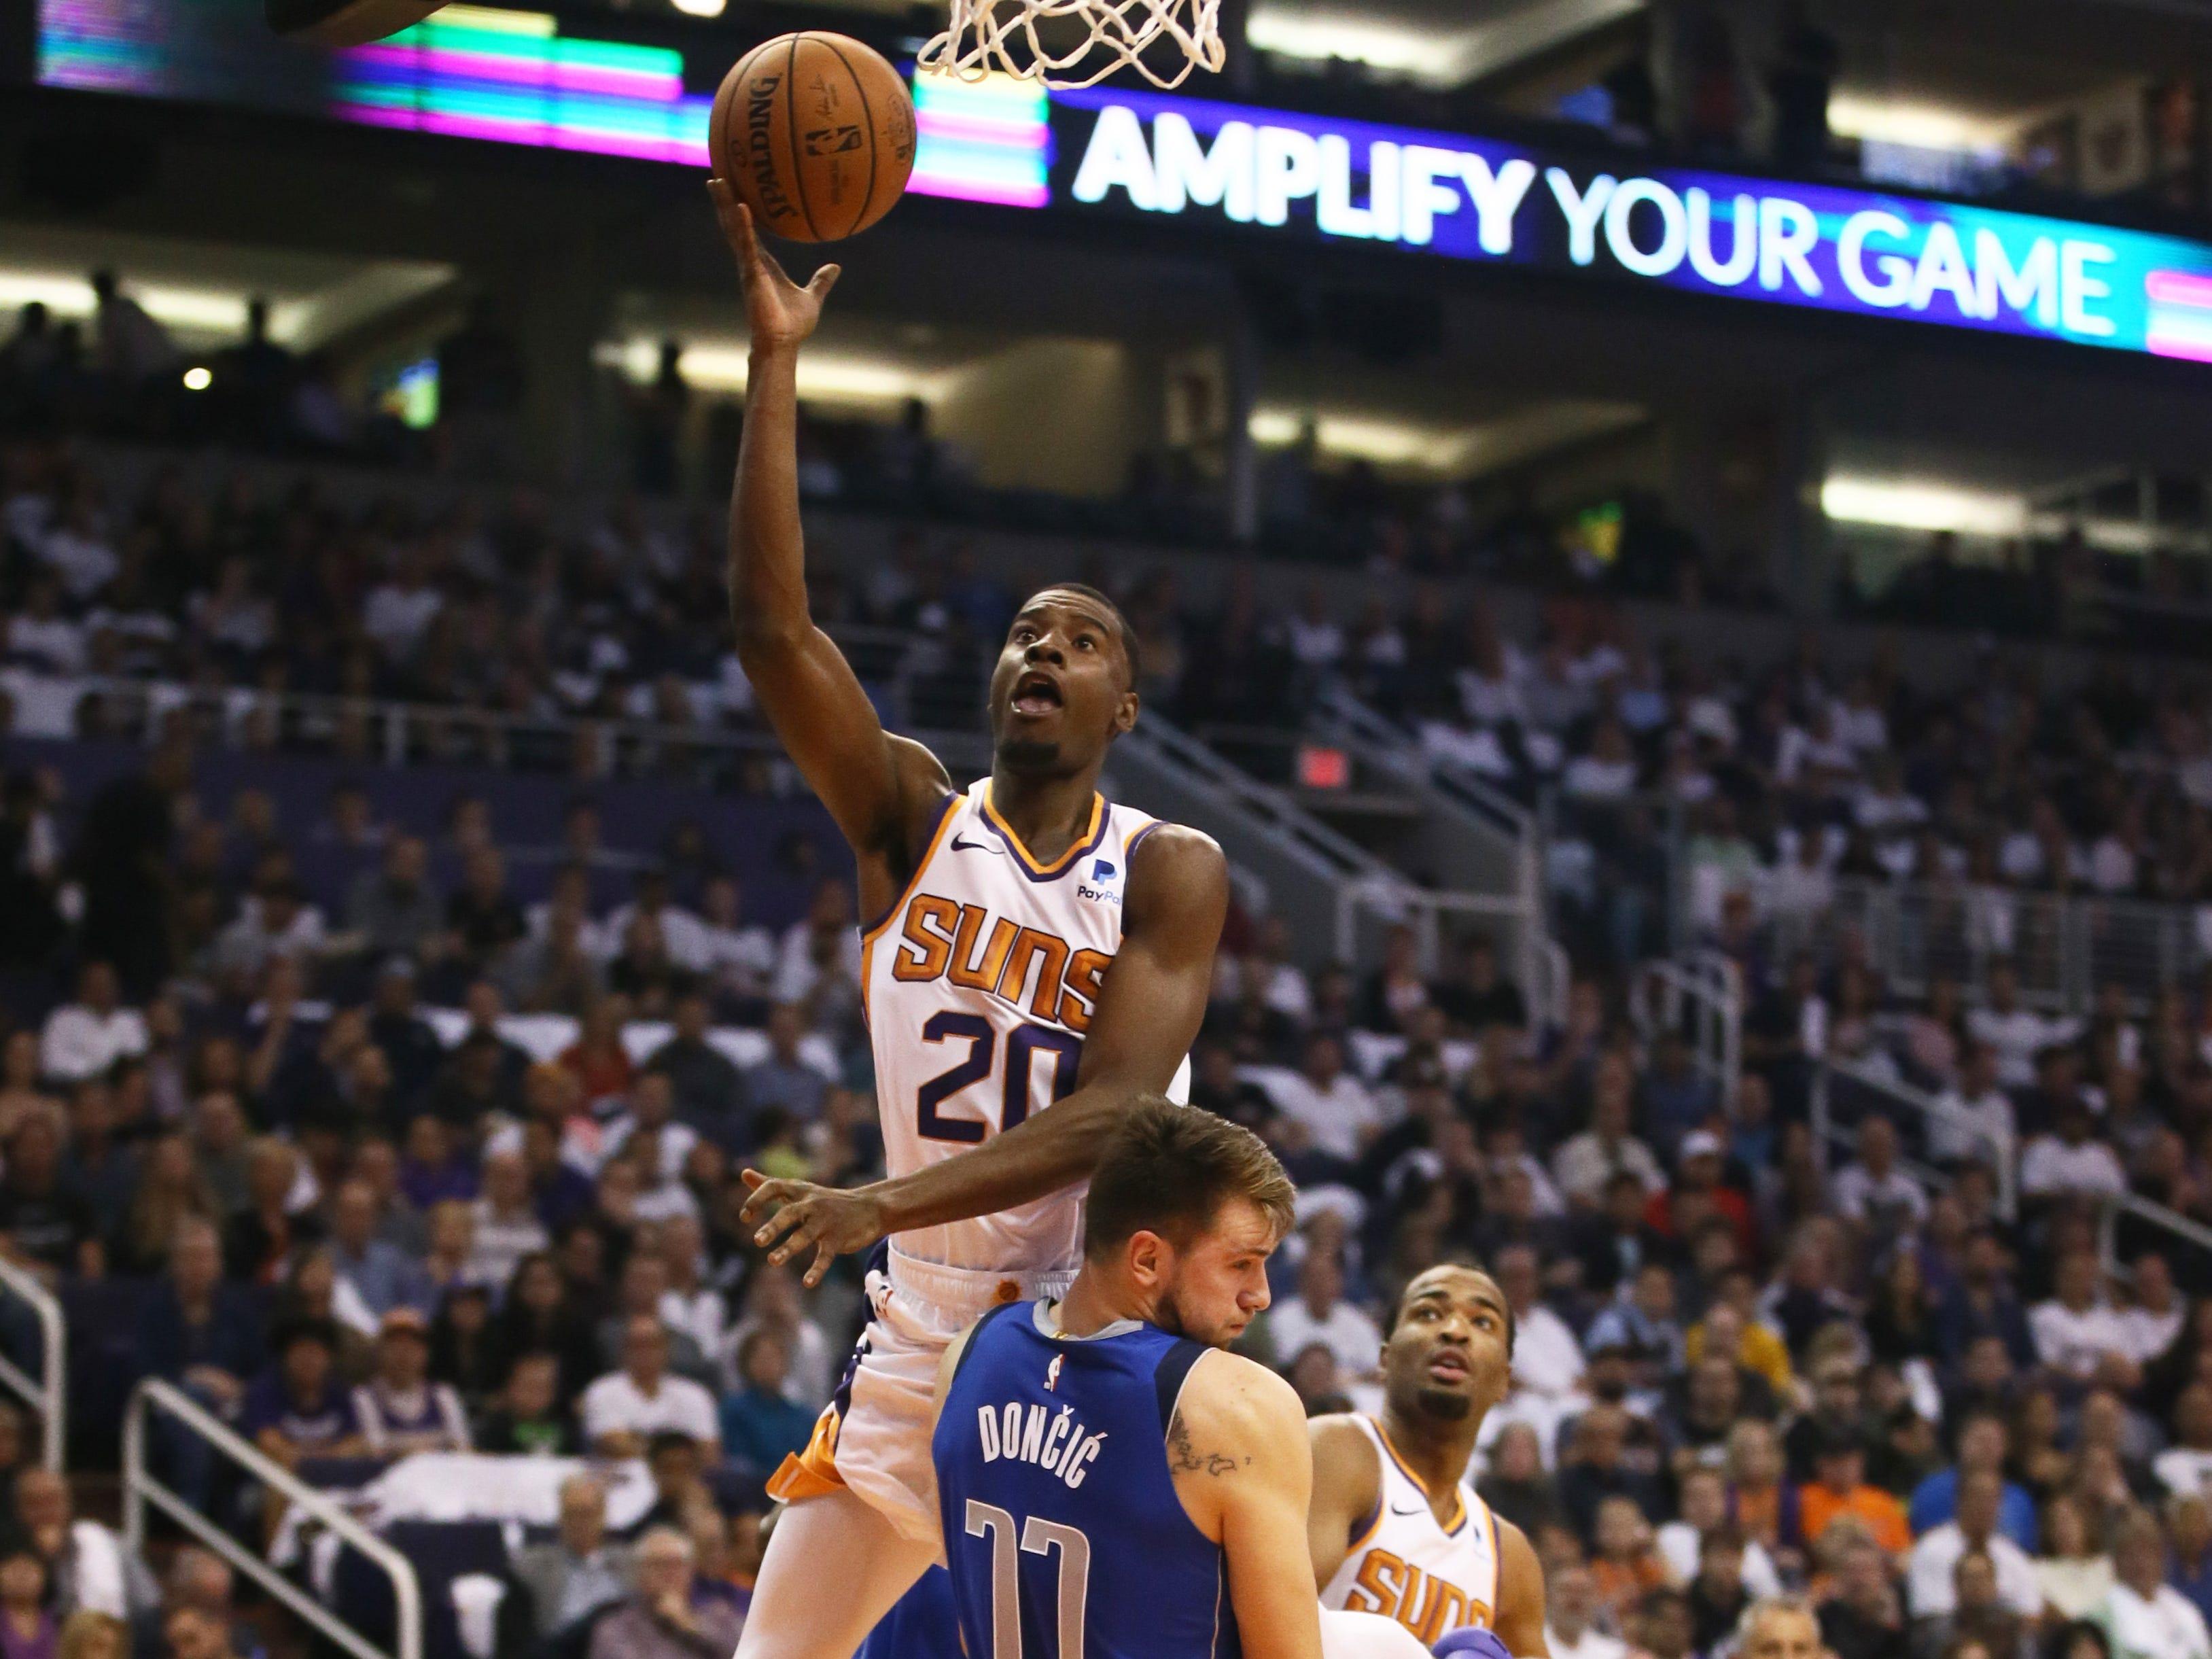 Phoenix Suns Josh Jackson shoots and scores against the Dallas Mavericks during the season opener at Talking Stick Resort Arena on Oct. 17, 2018, in Phoenix, Ariz.